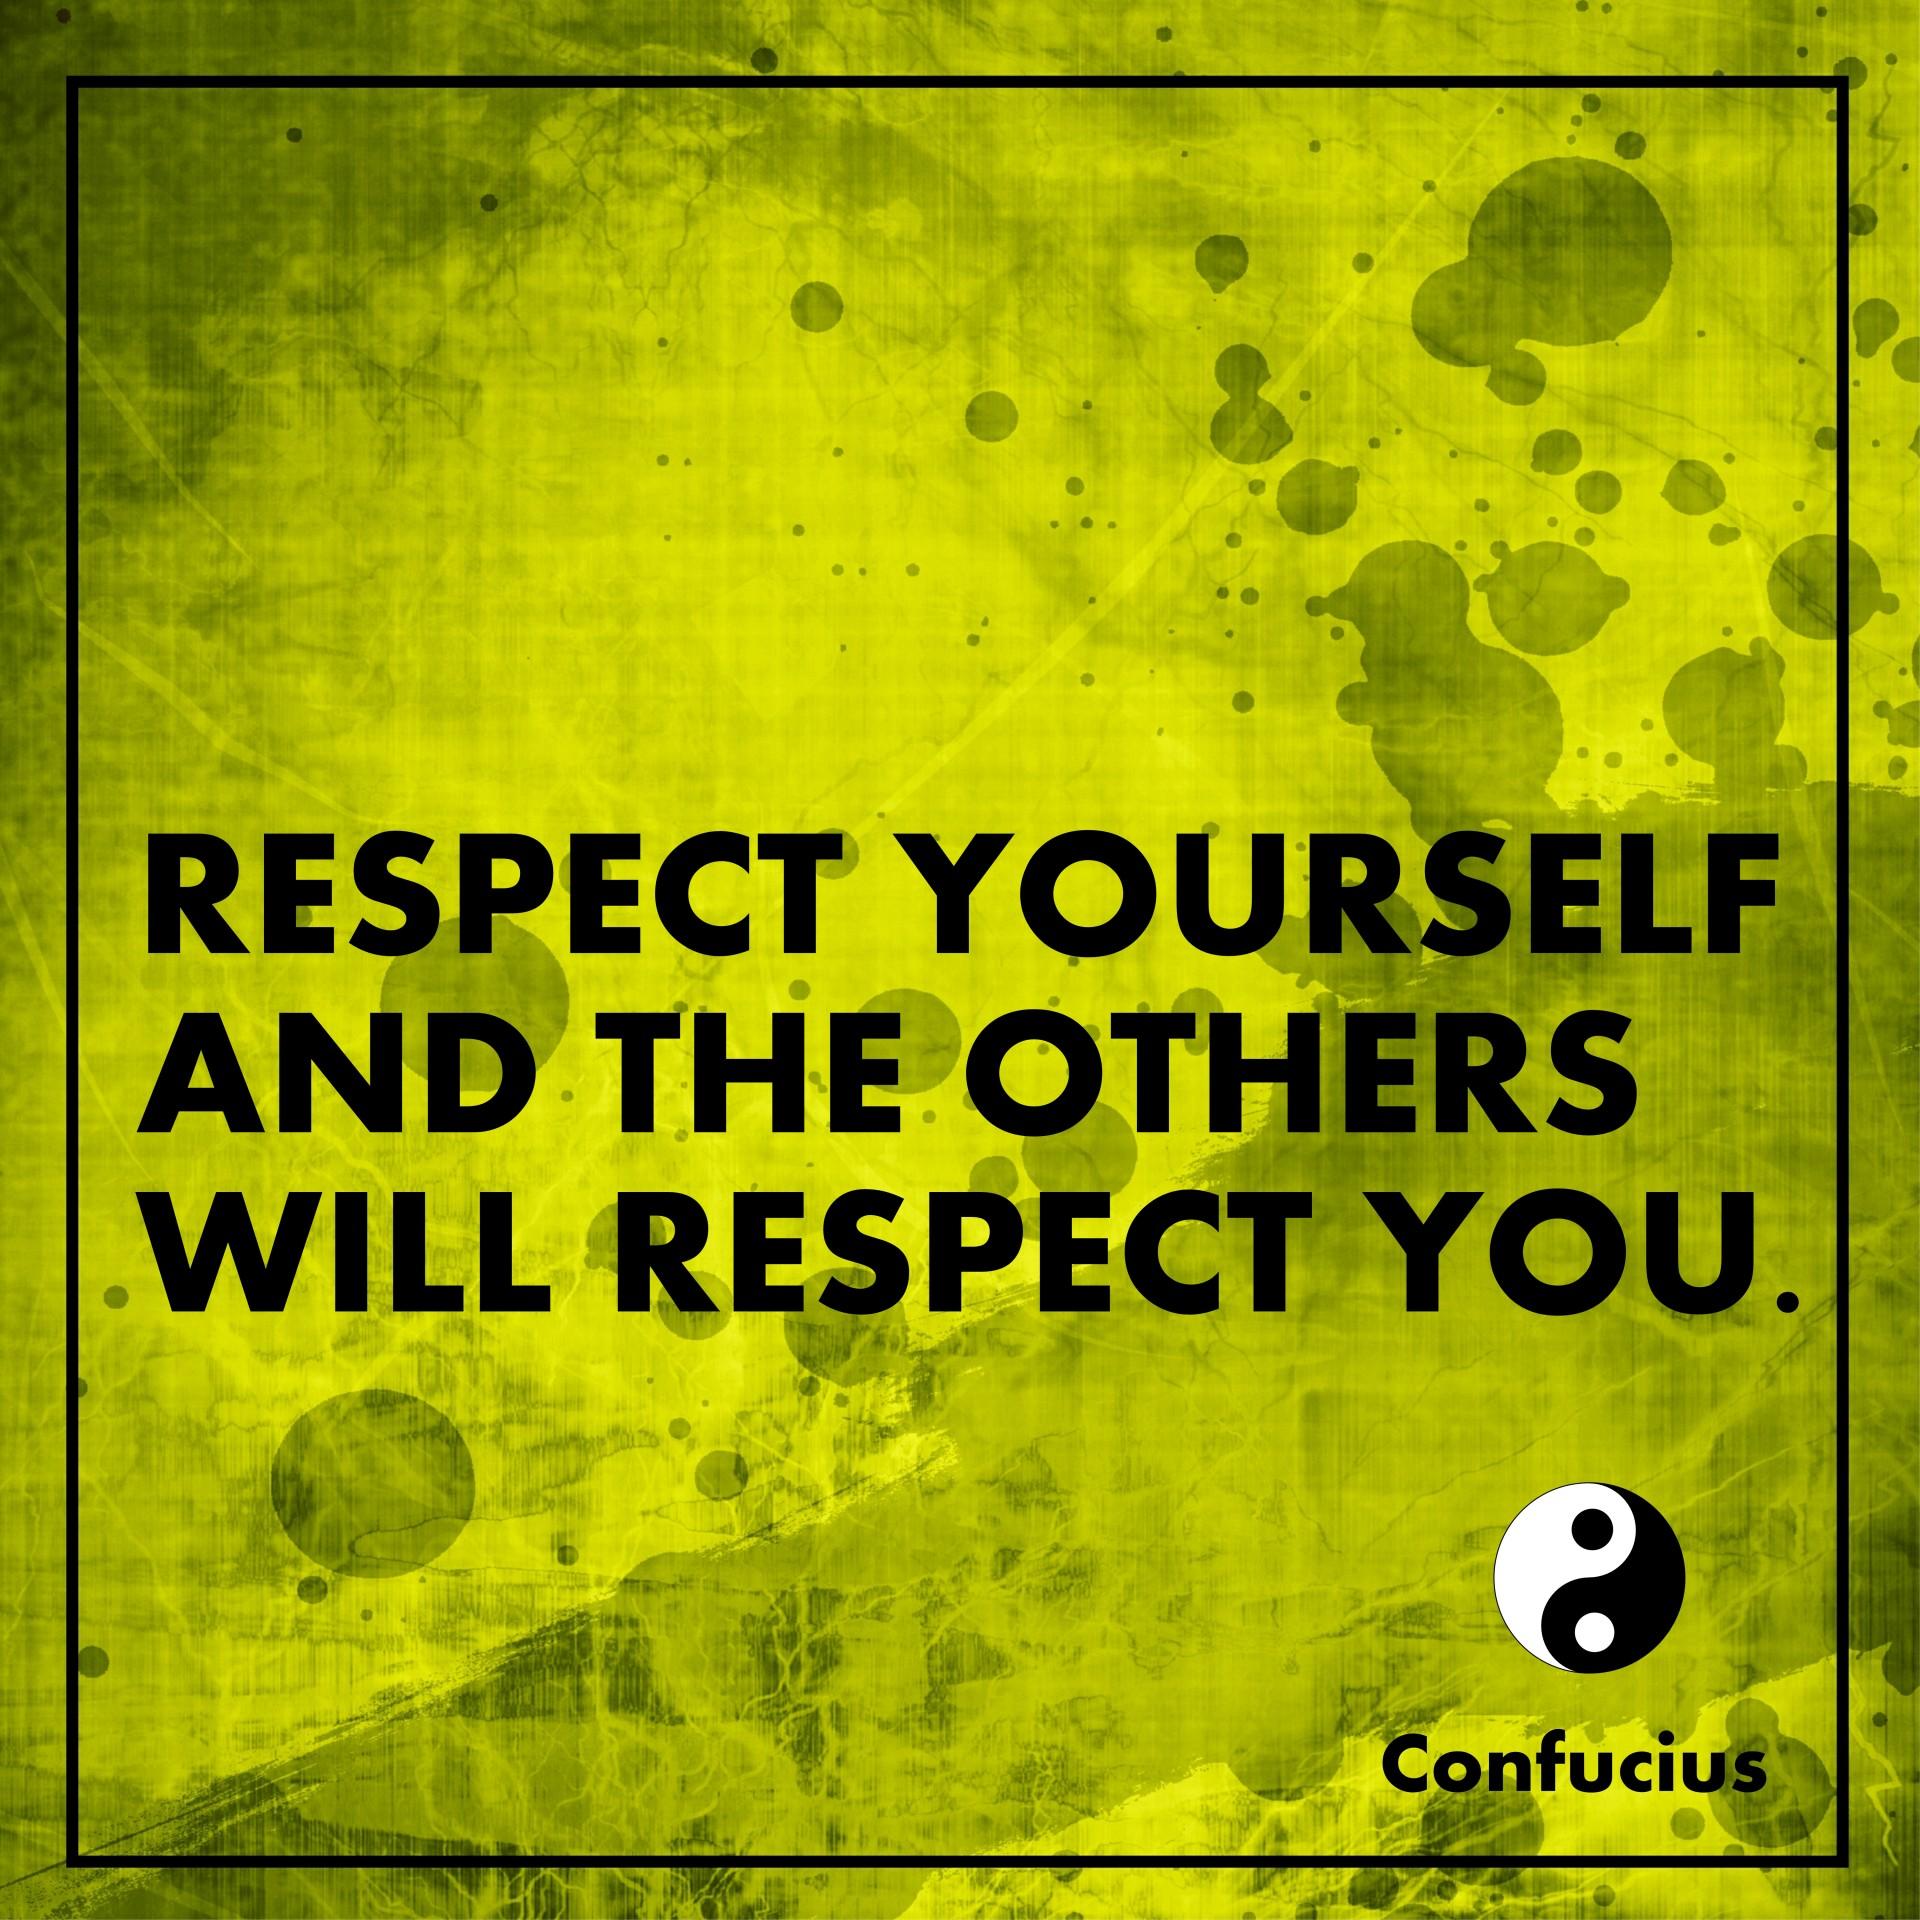 Quote Quote Wallpaper Respect Yourself Confucius Free Stock Photo Public